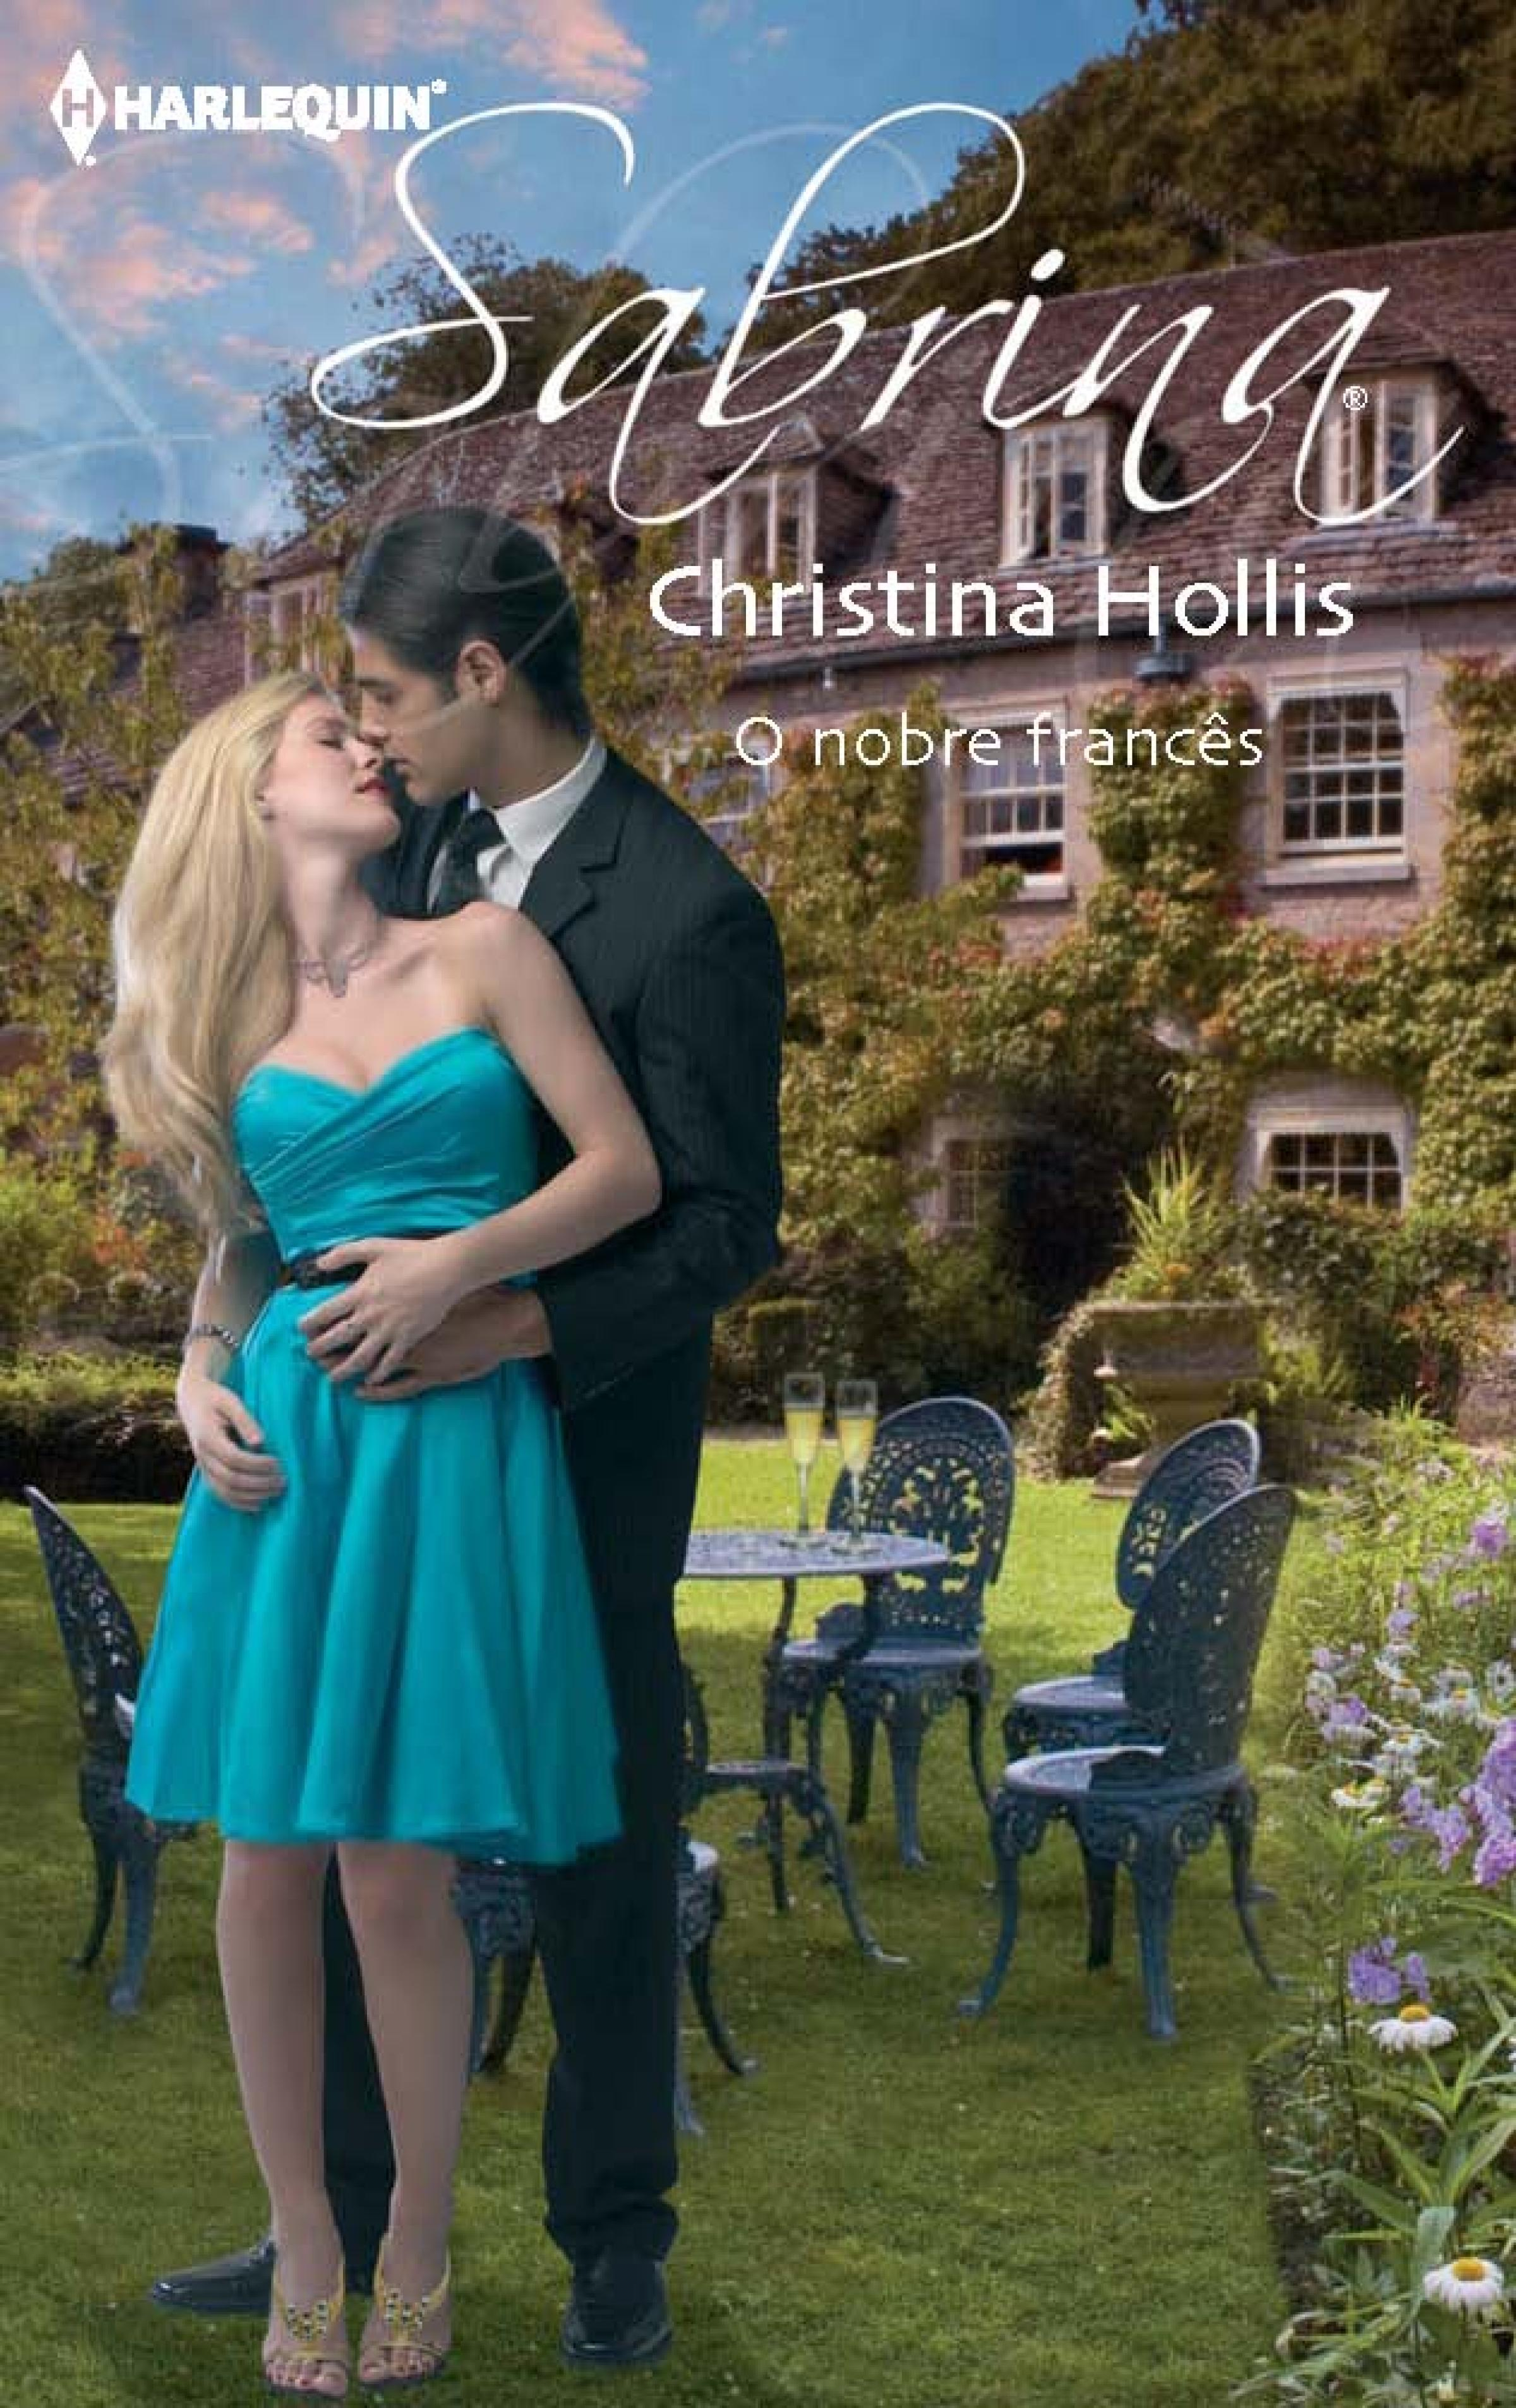 Christina Hollis O nobre francês цена